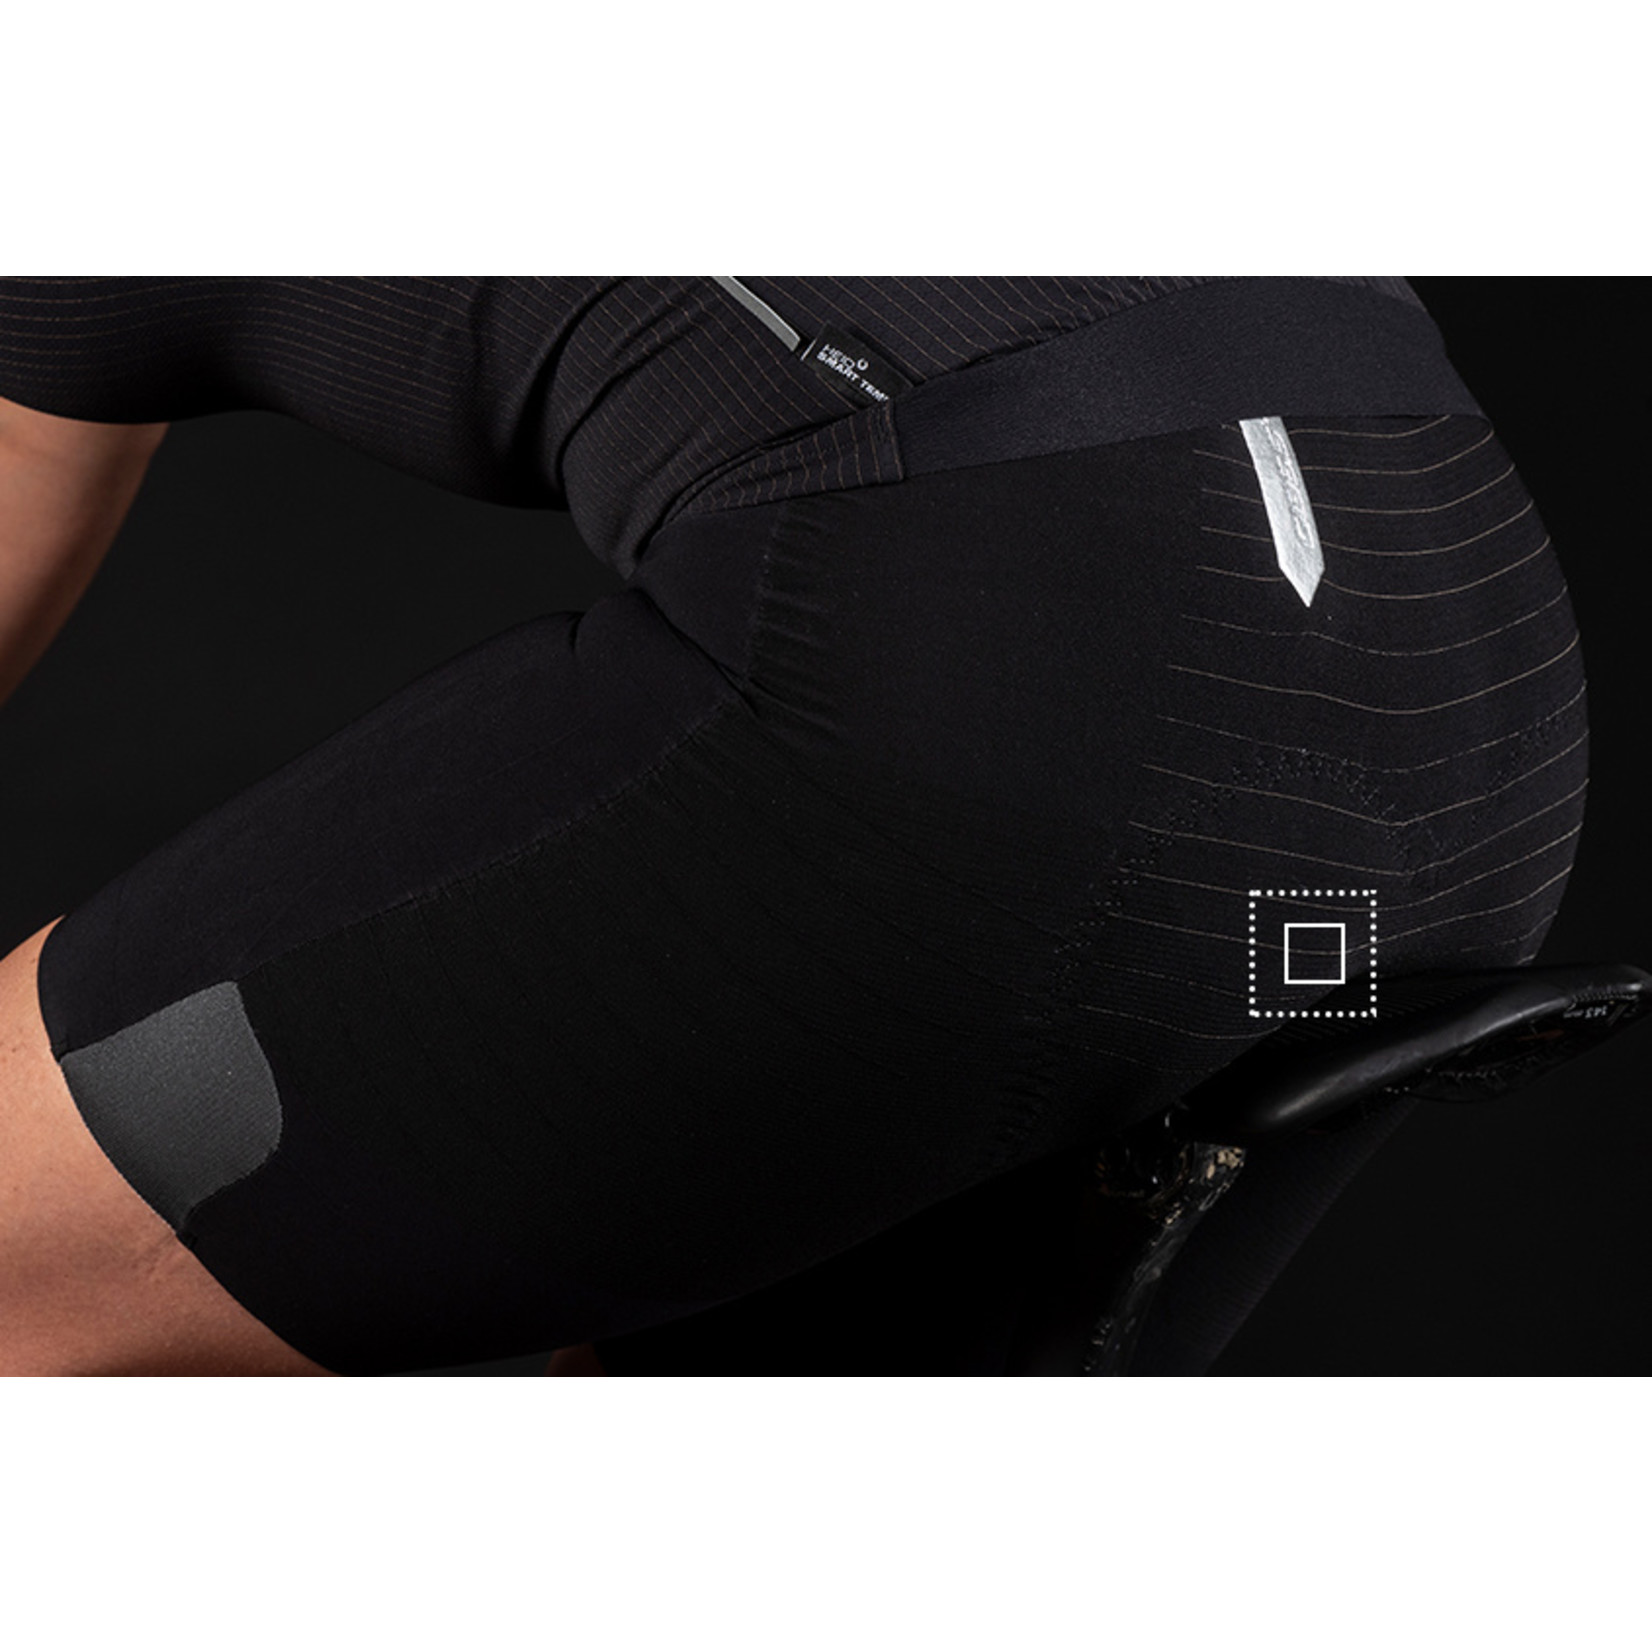 Q36.5 Q36.5 Women Unique Bib Shorts - Black